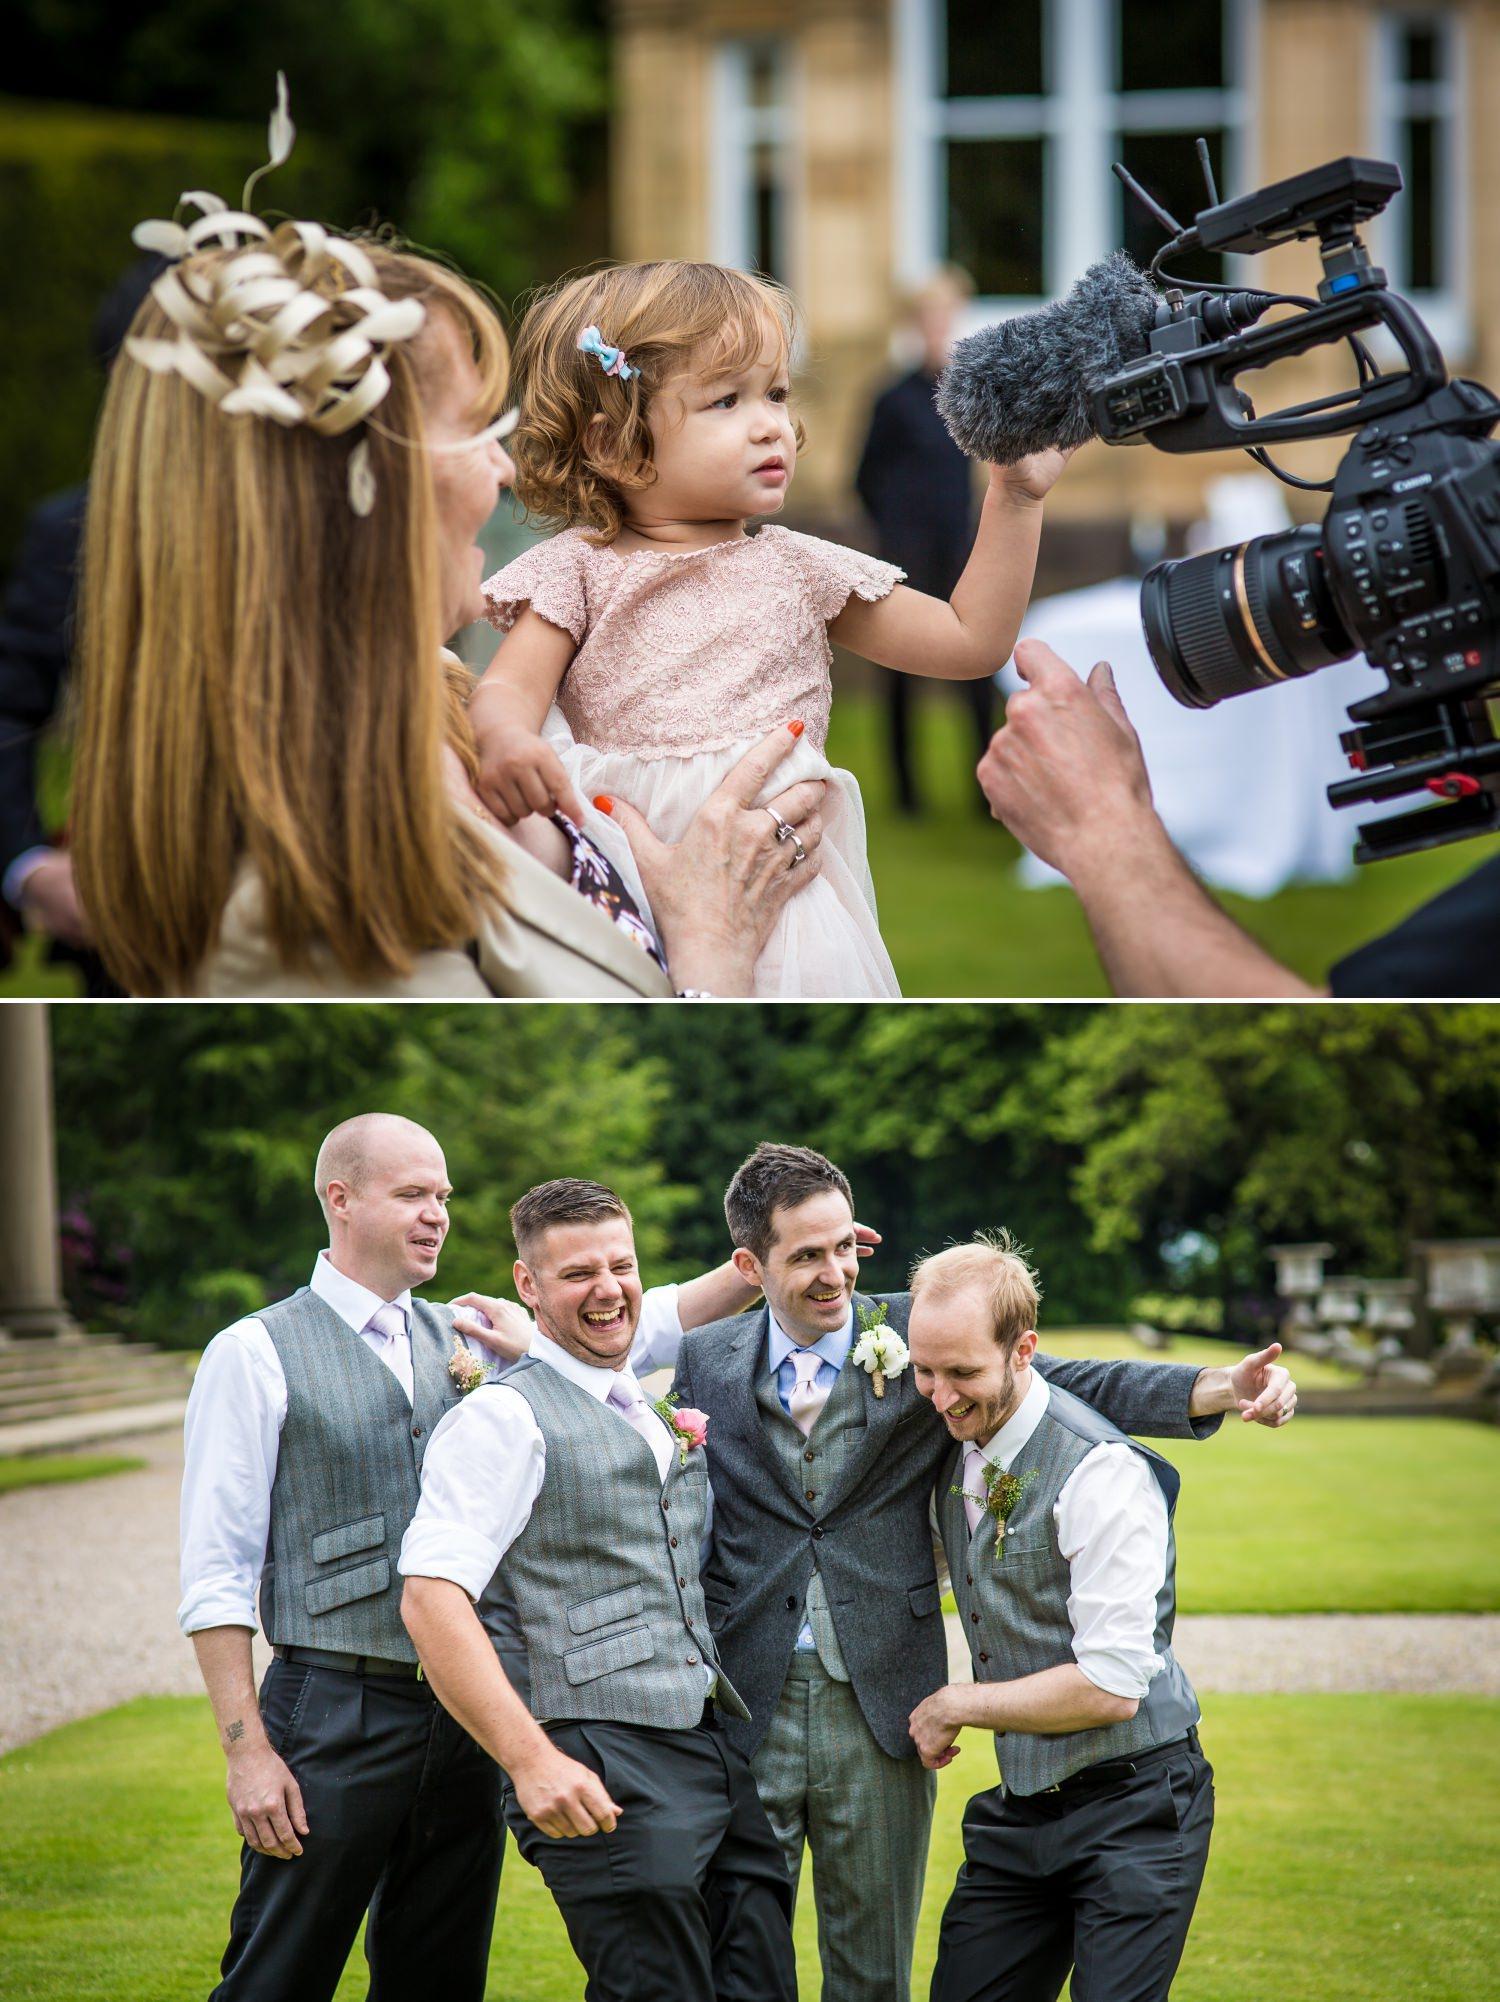 Wedding Photograph of the groomsmen at Cheshire wedding venue, Tatton Park